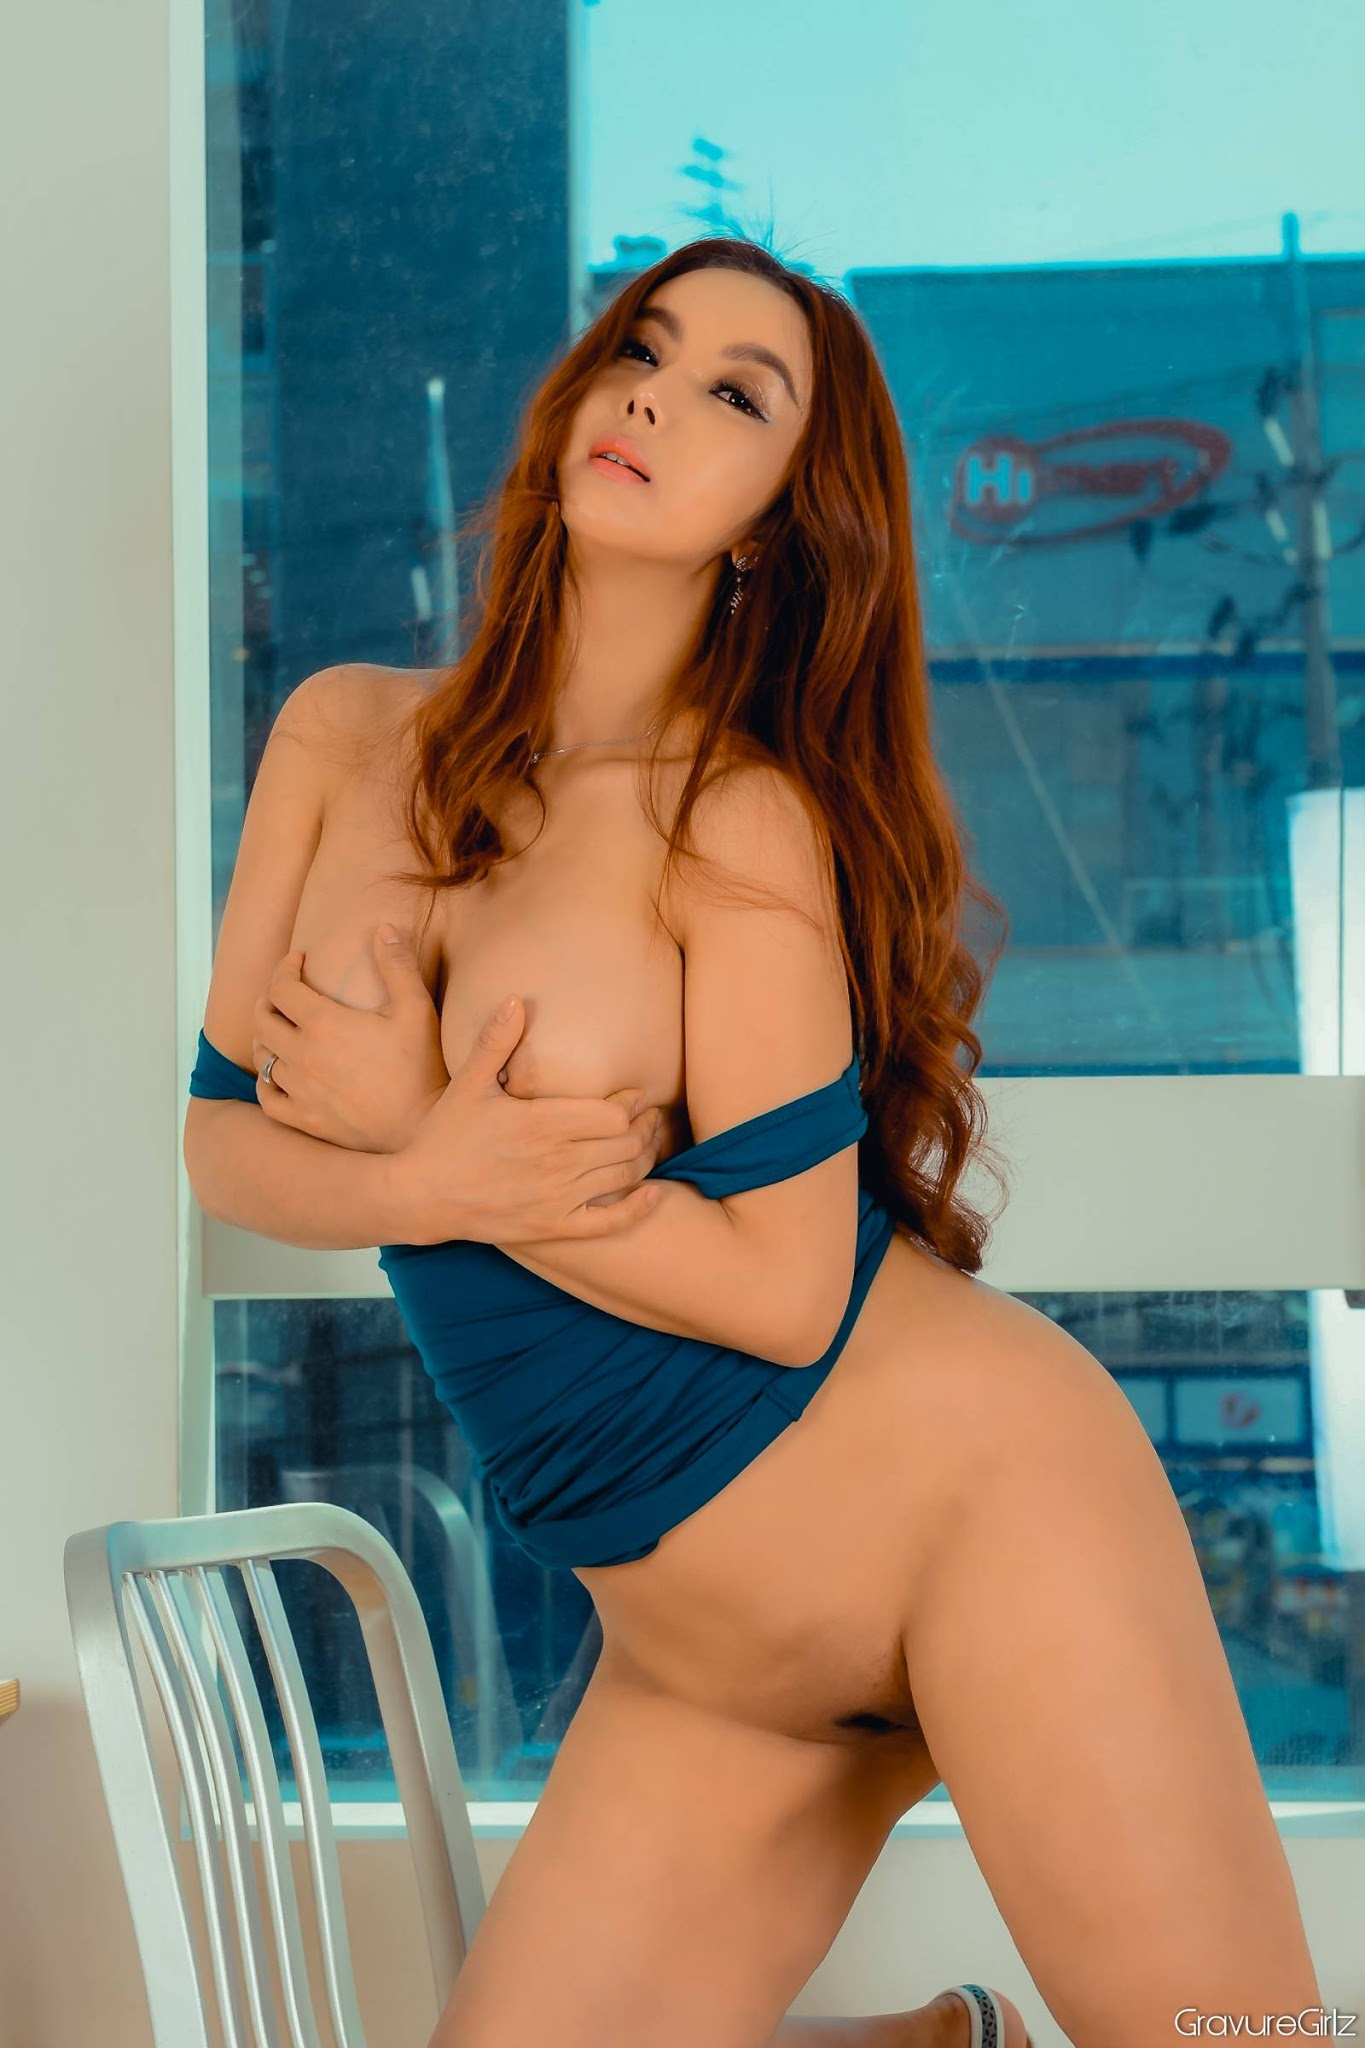 koreagirl-naked-women-getting-fucked-to-orgasm